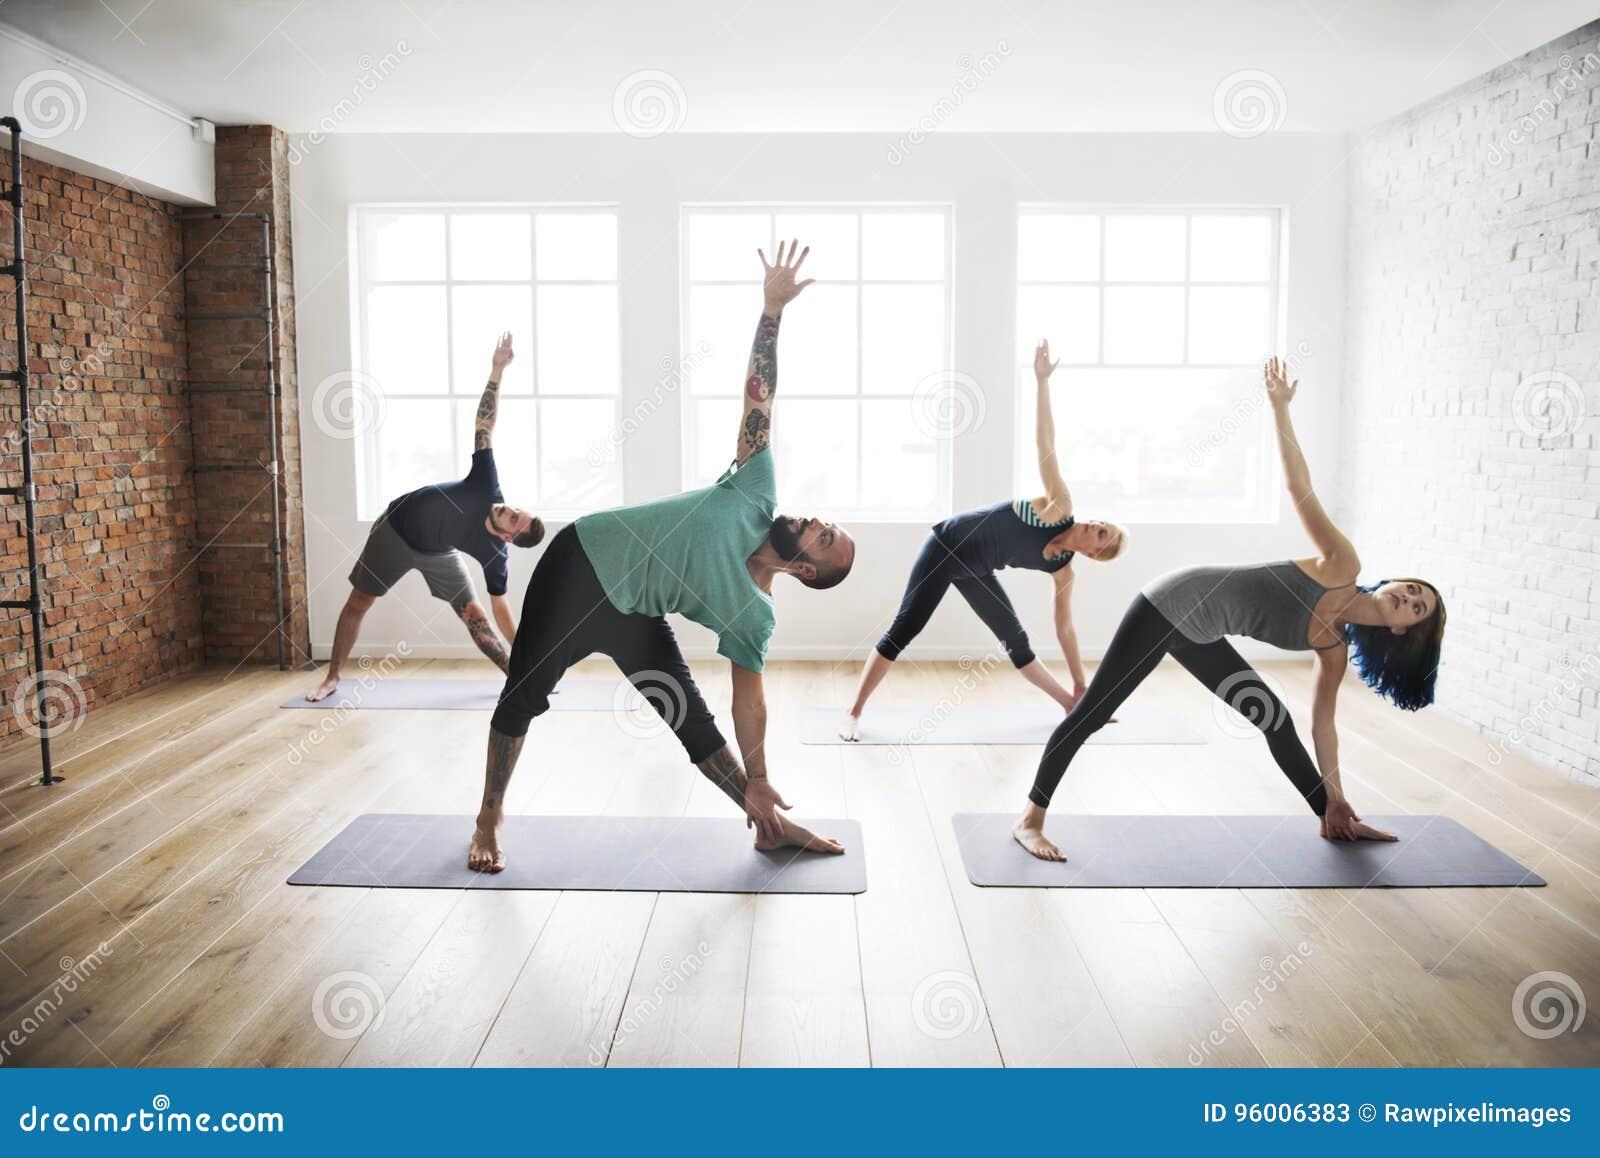 Yoga-Übungs-Klassen-Gesundheits-Konzept